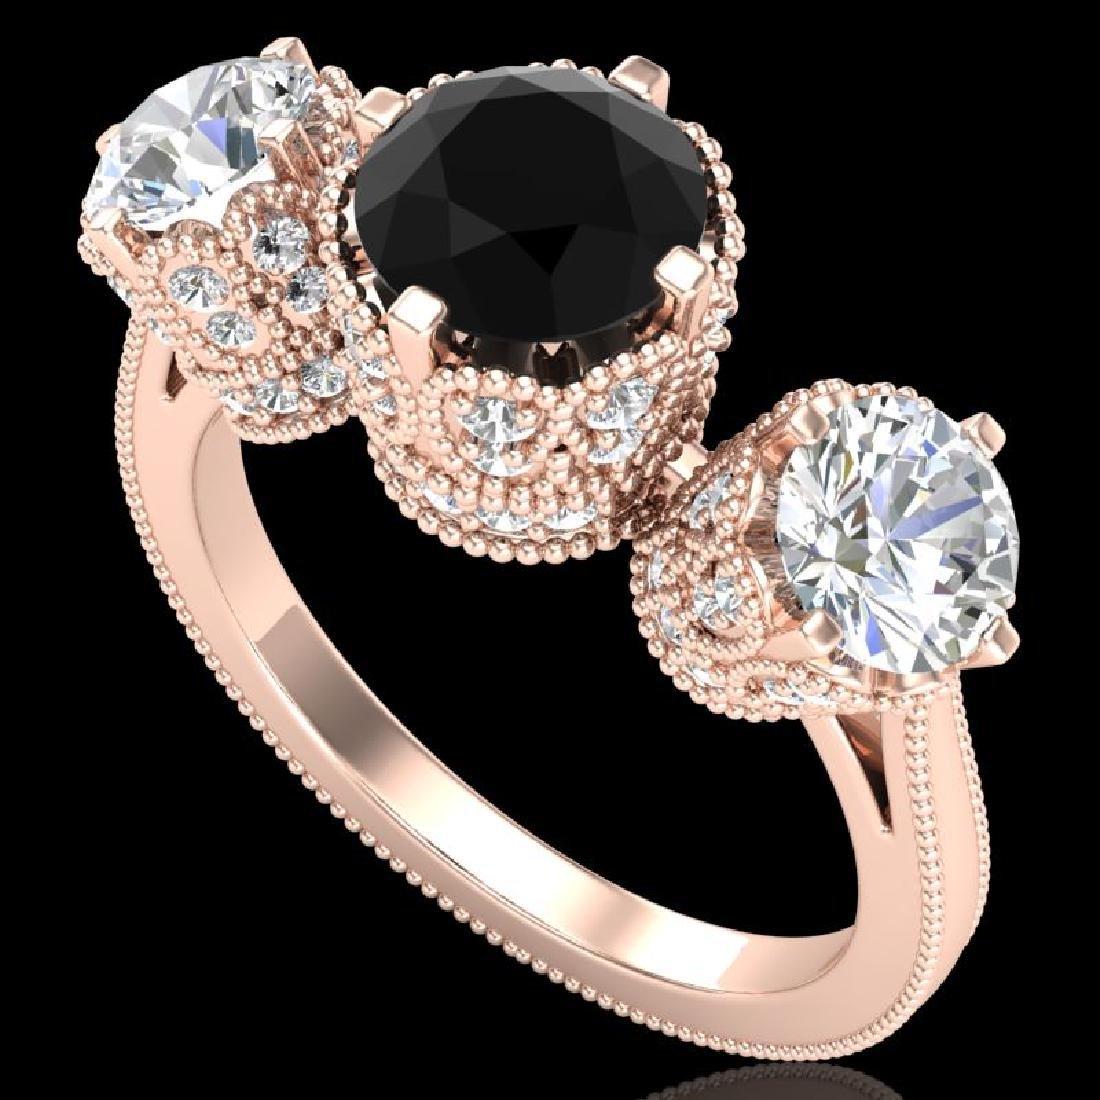 3.06 CTW Fancy Black Diamond Solitaire Art Deco 3 Stone